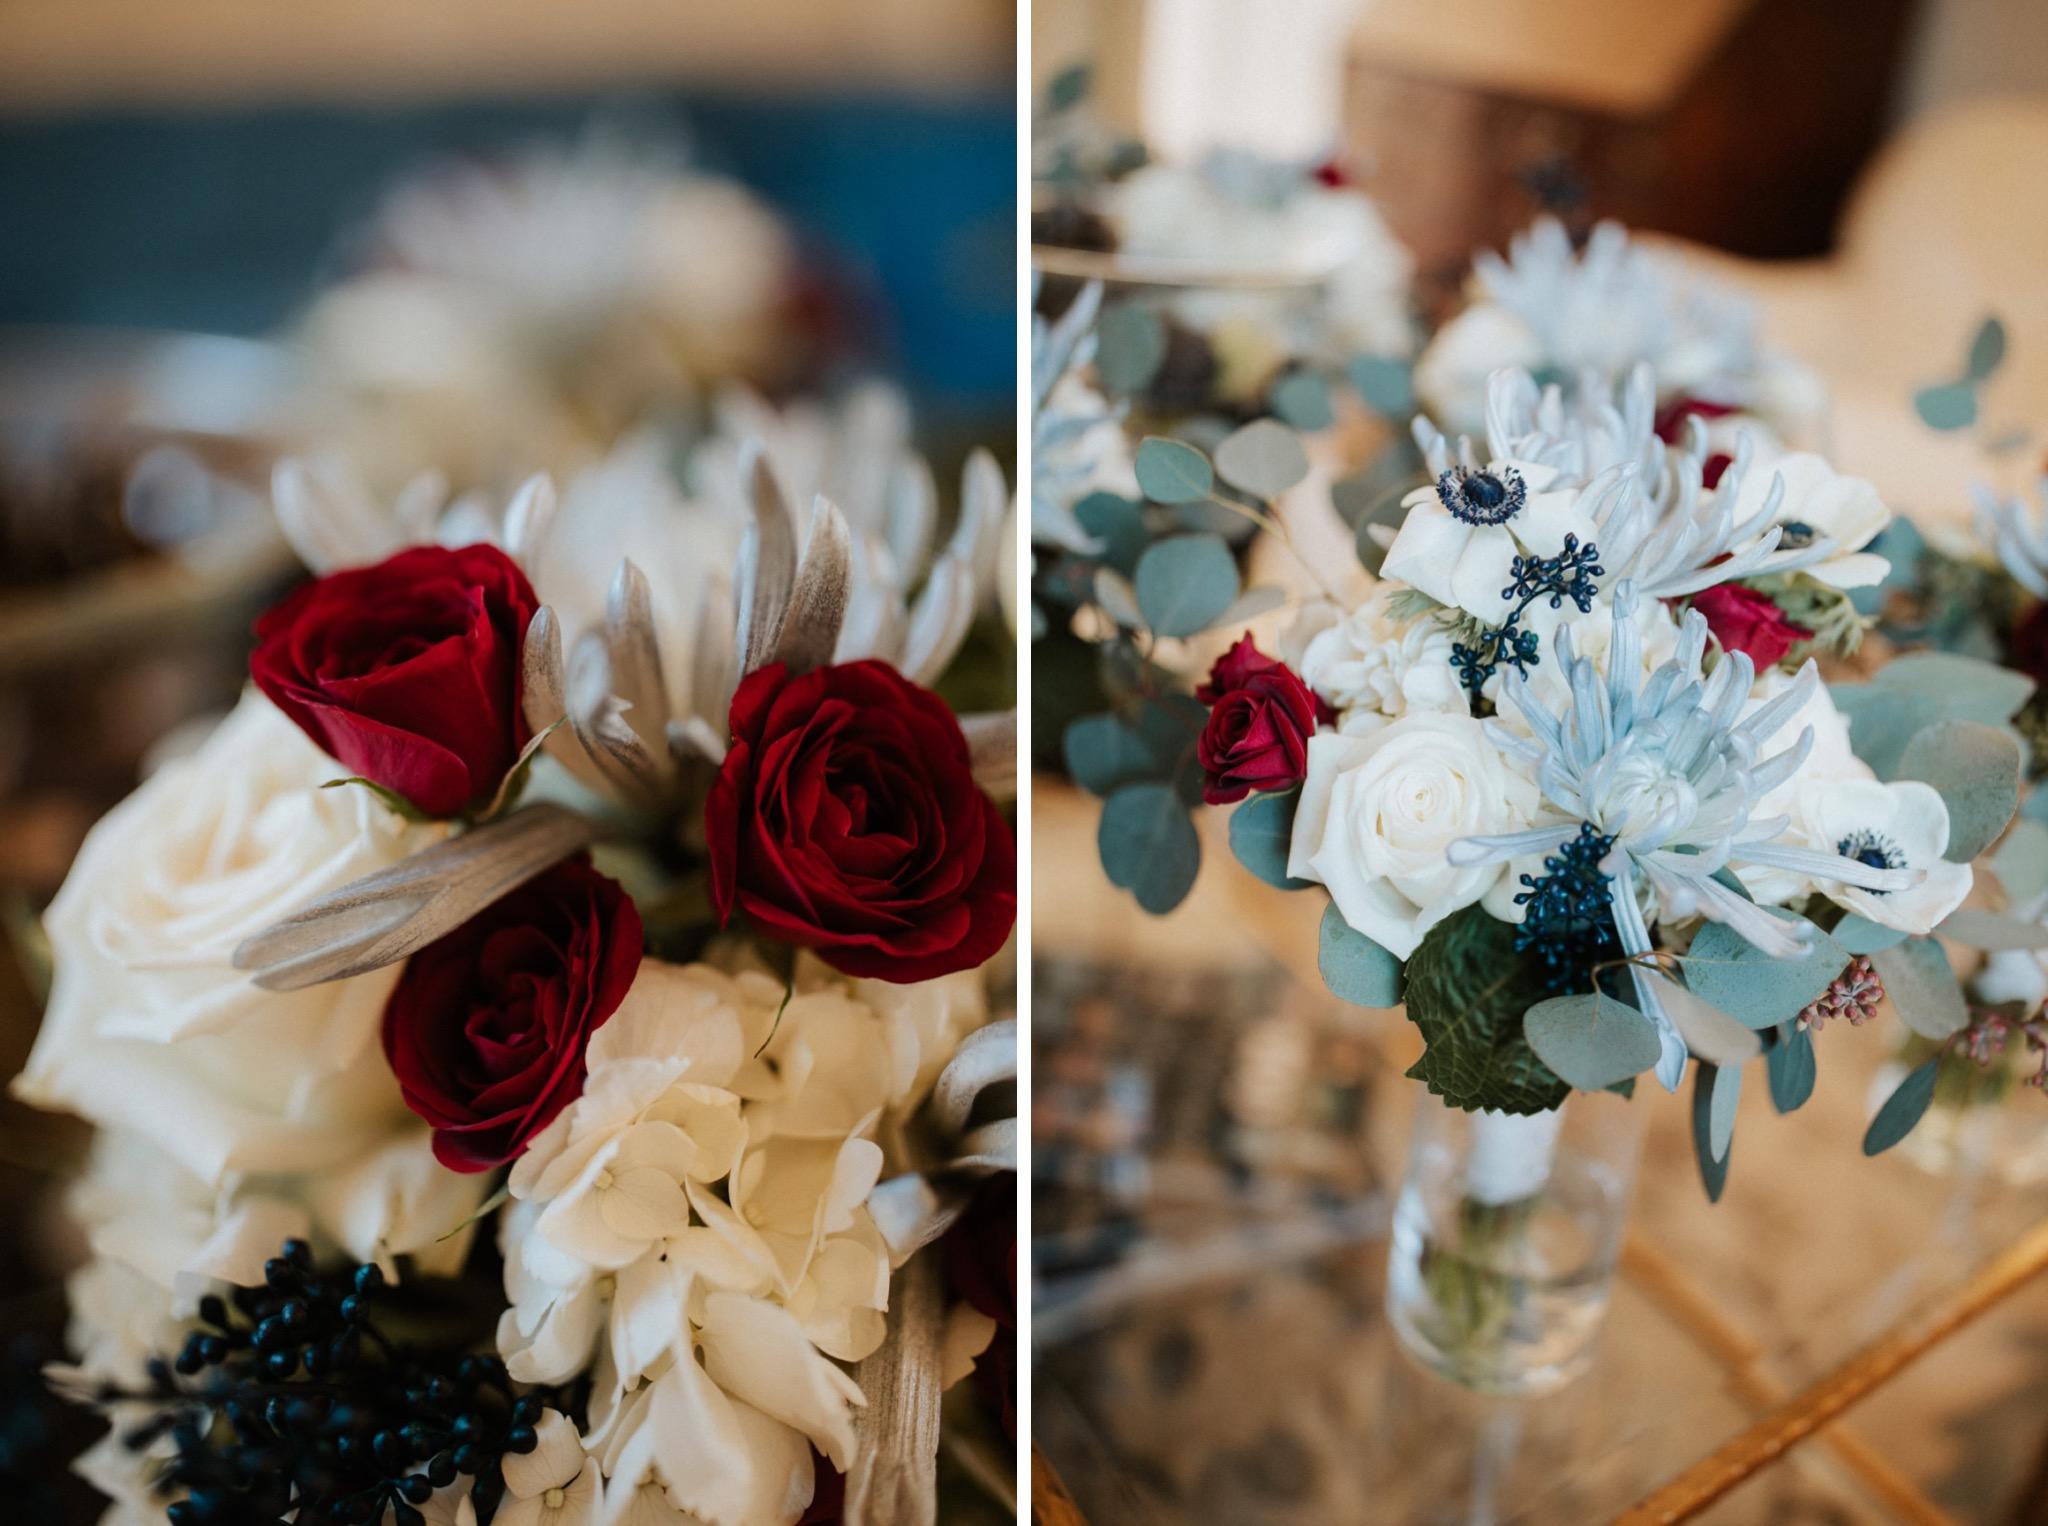 13_West Manor Estate Weddings - Pat Cori Photography-31_West Manor Estate Weddings - Pat Cori Photography-30_Sage_details_VirginiaWeddingPhotographer_WestManorEstate_dustyblue_PatCoriPhotography.jpg